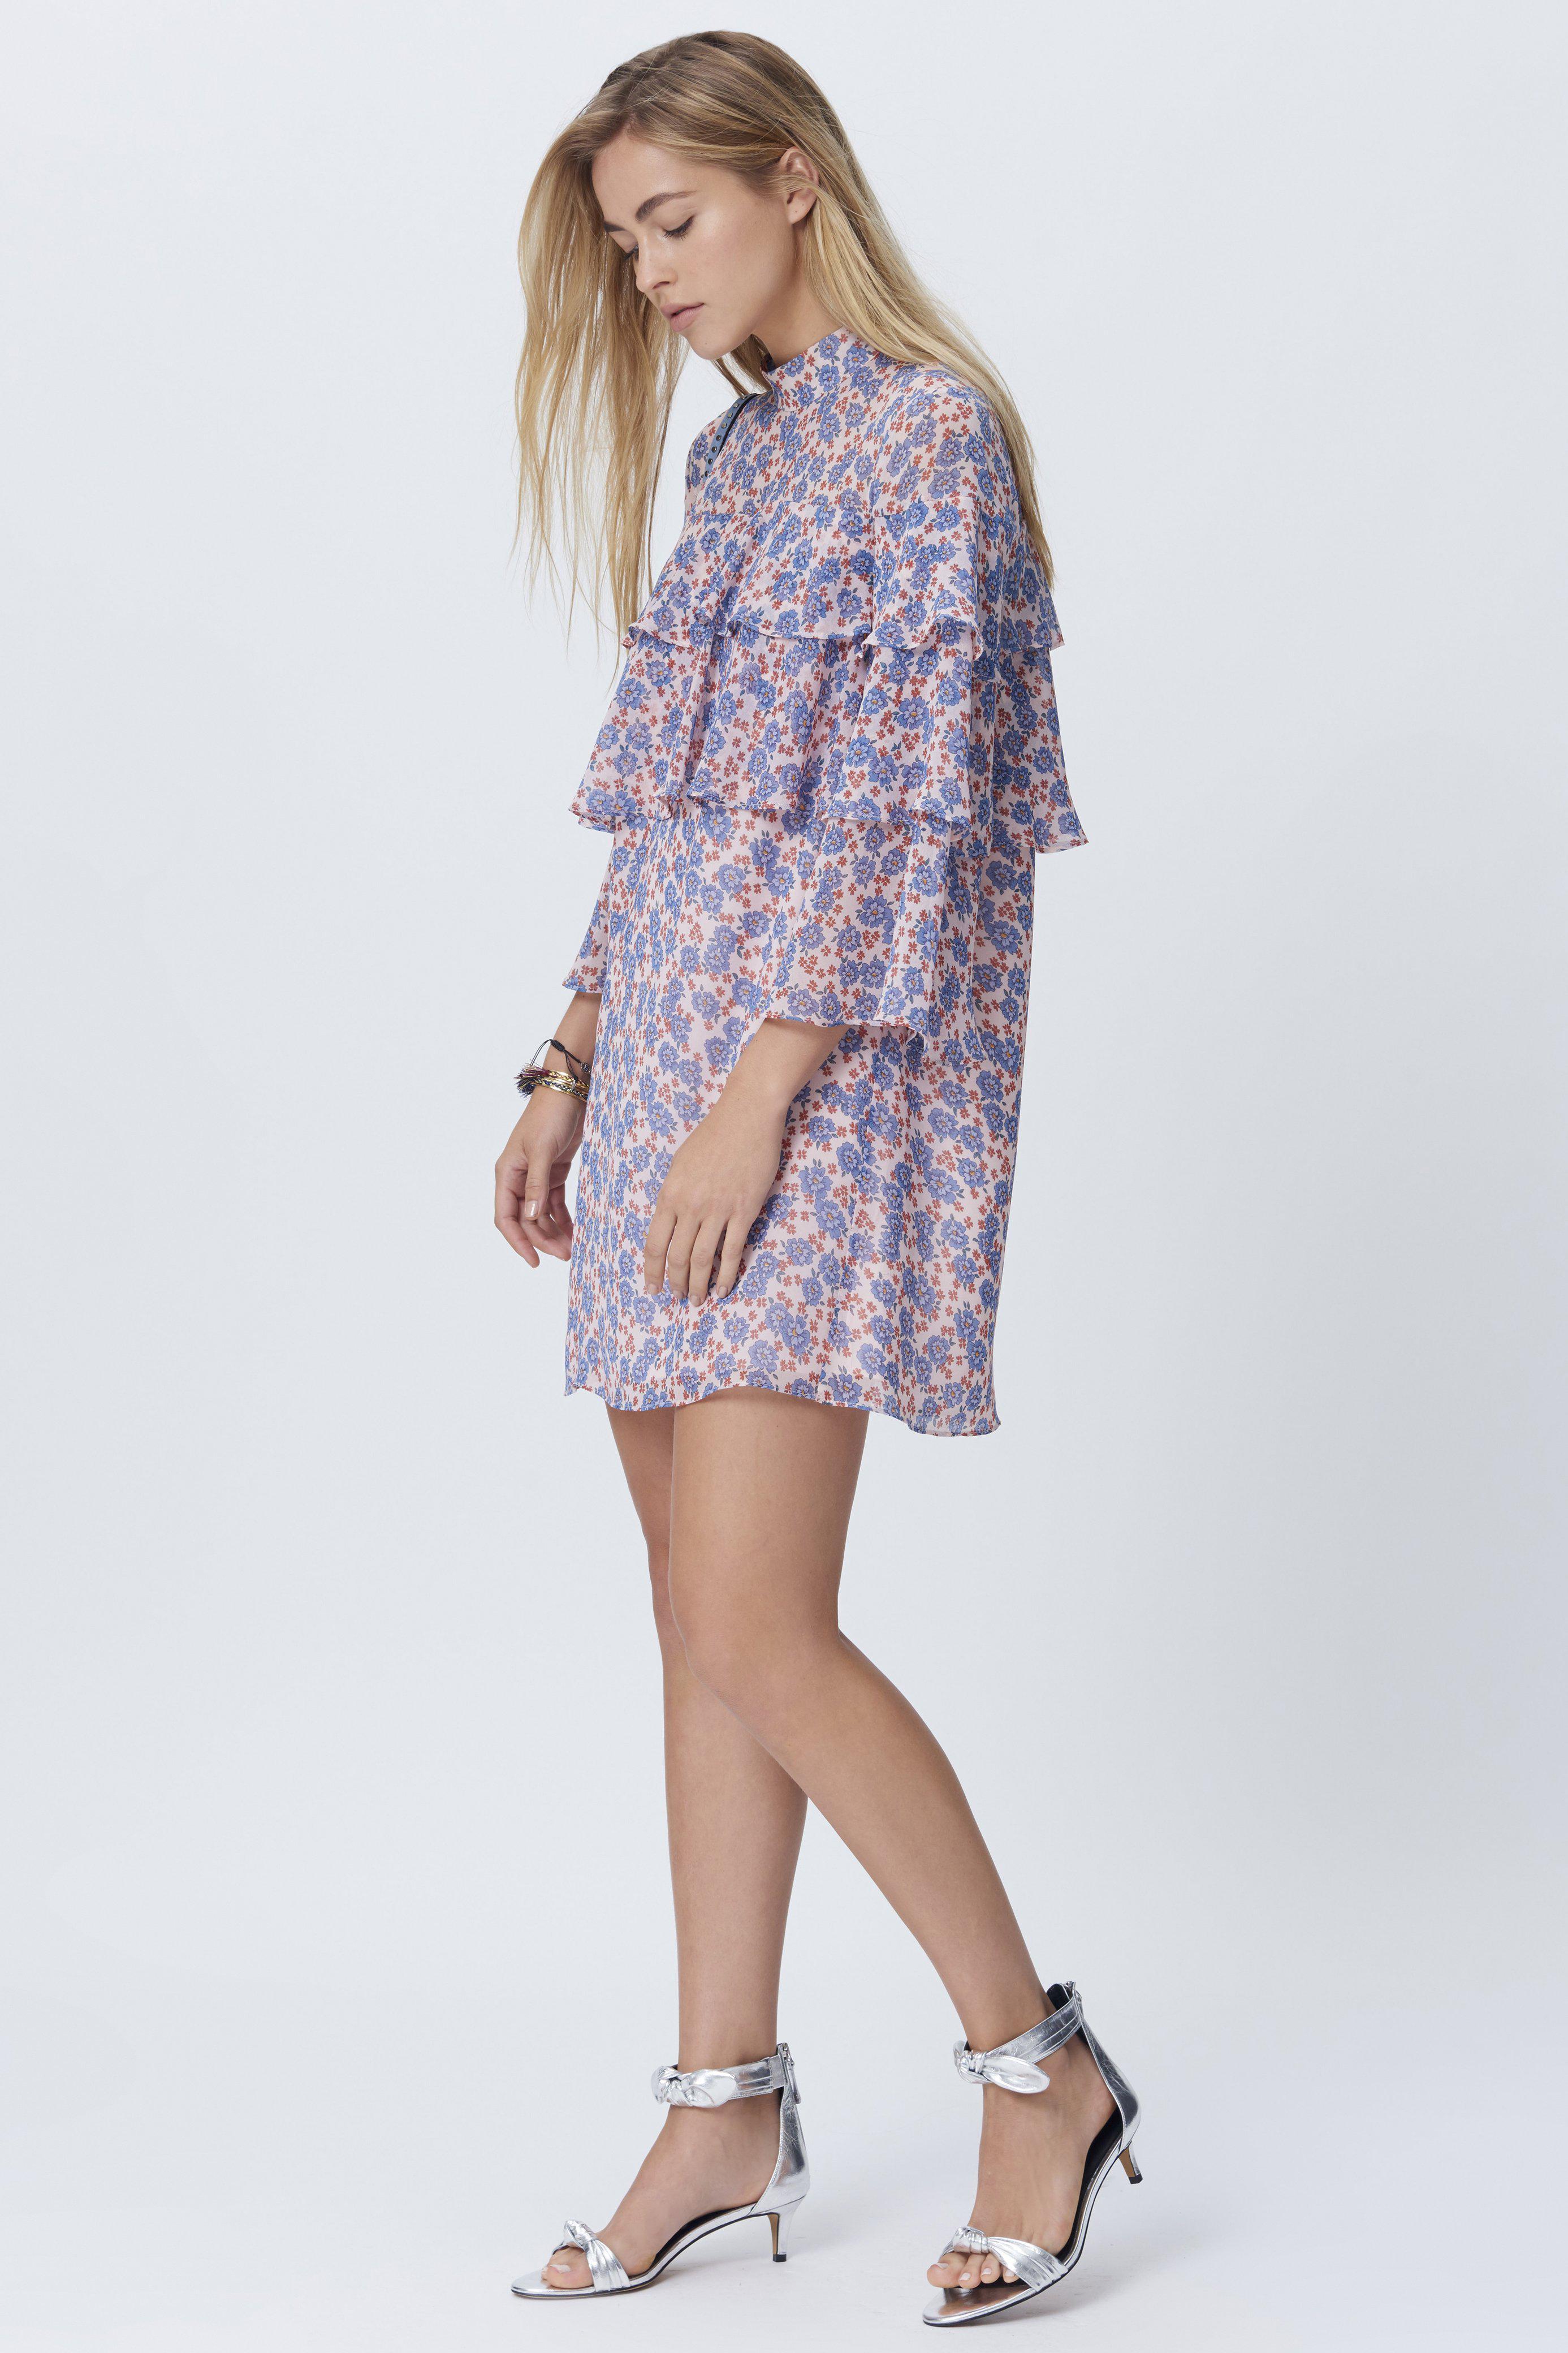 Rebecca Minkoff Pink Darcy Dress